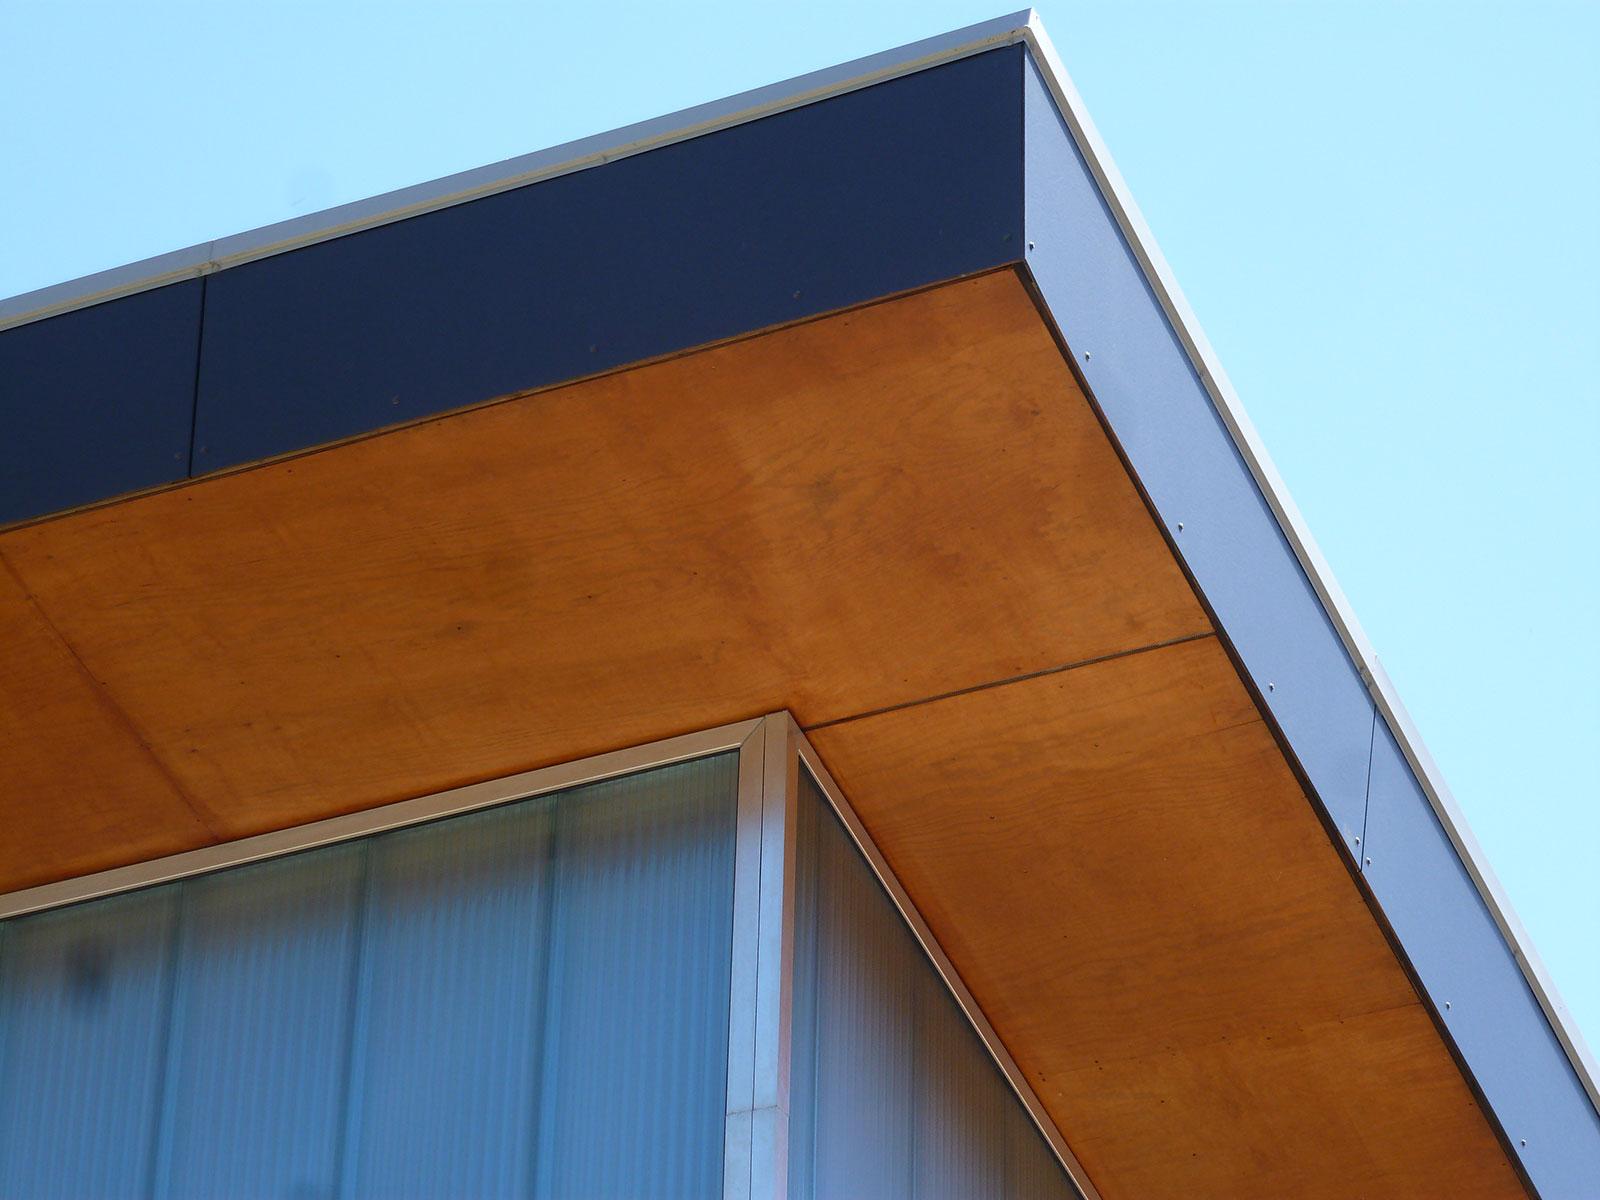 avant toits et auvents zanon charpentezanon charpente. Black Bedroom Furniture Sets. Home Design Ideas